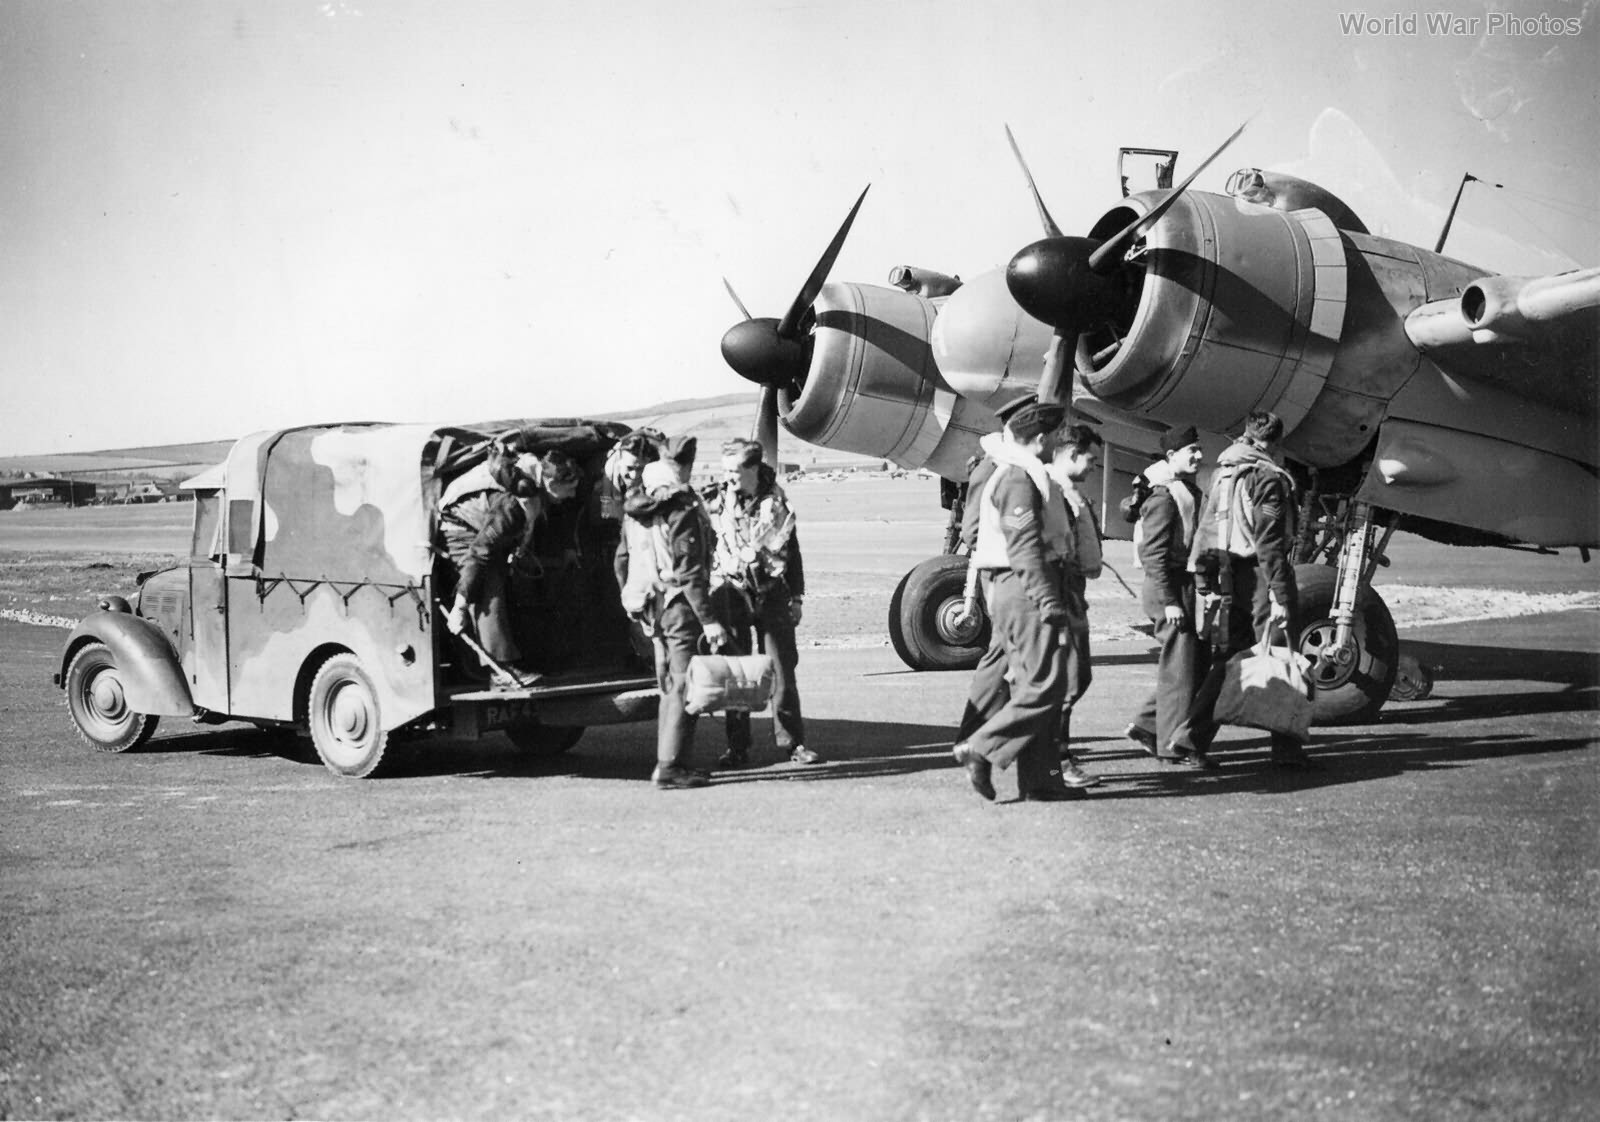 Beaufighter Coastal Command